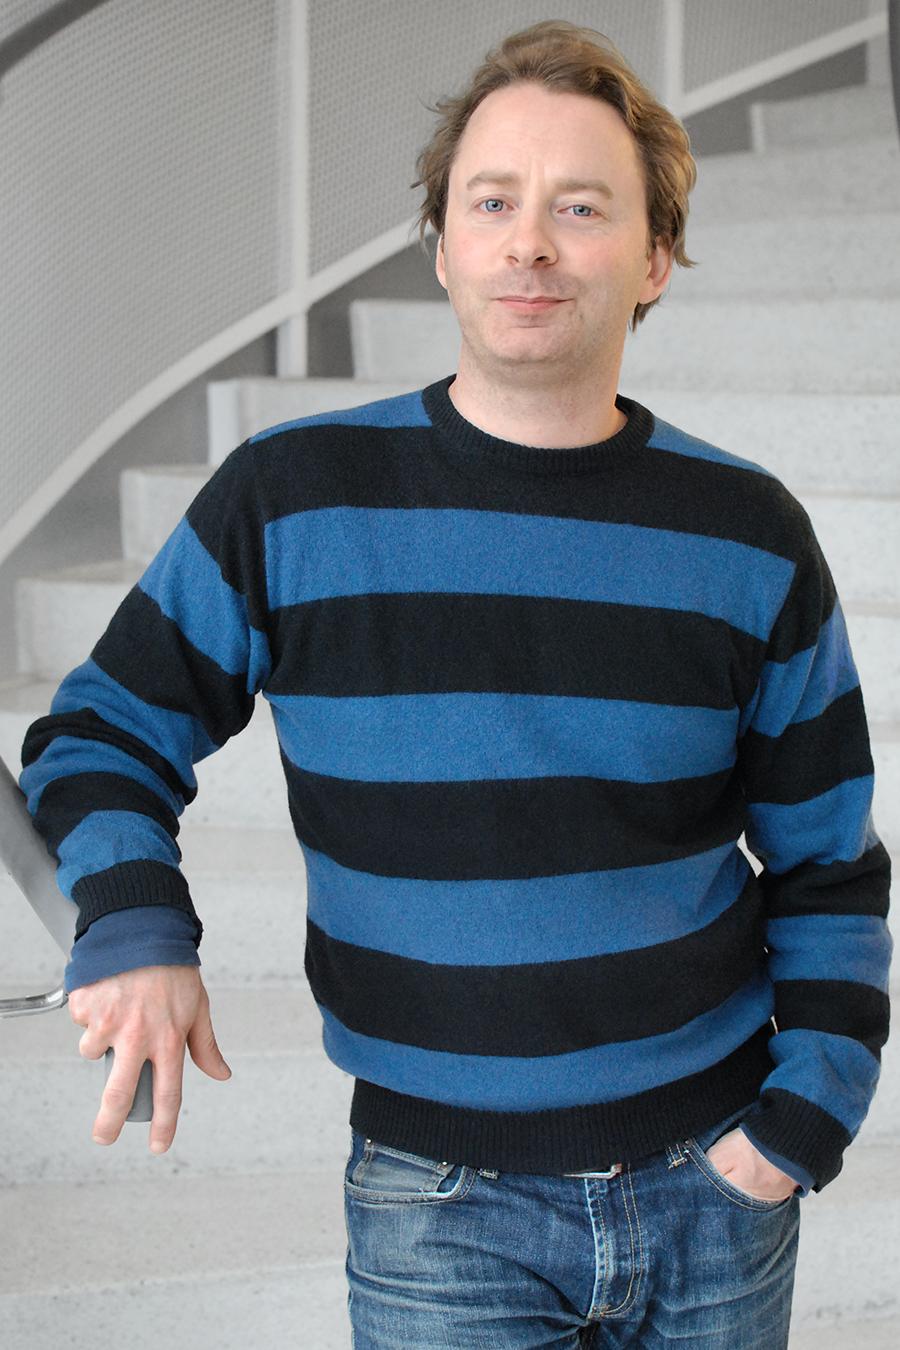 Lars-Ove Johansson